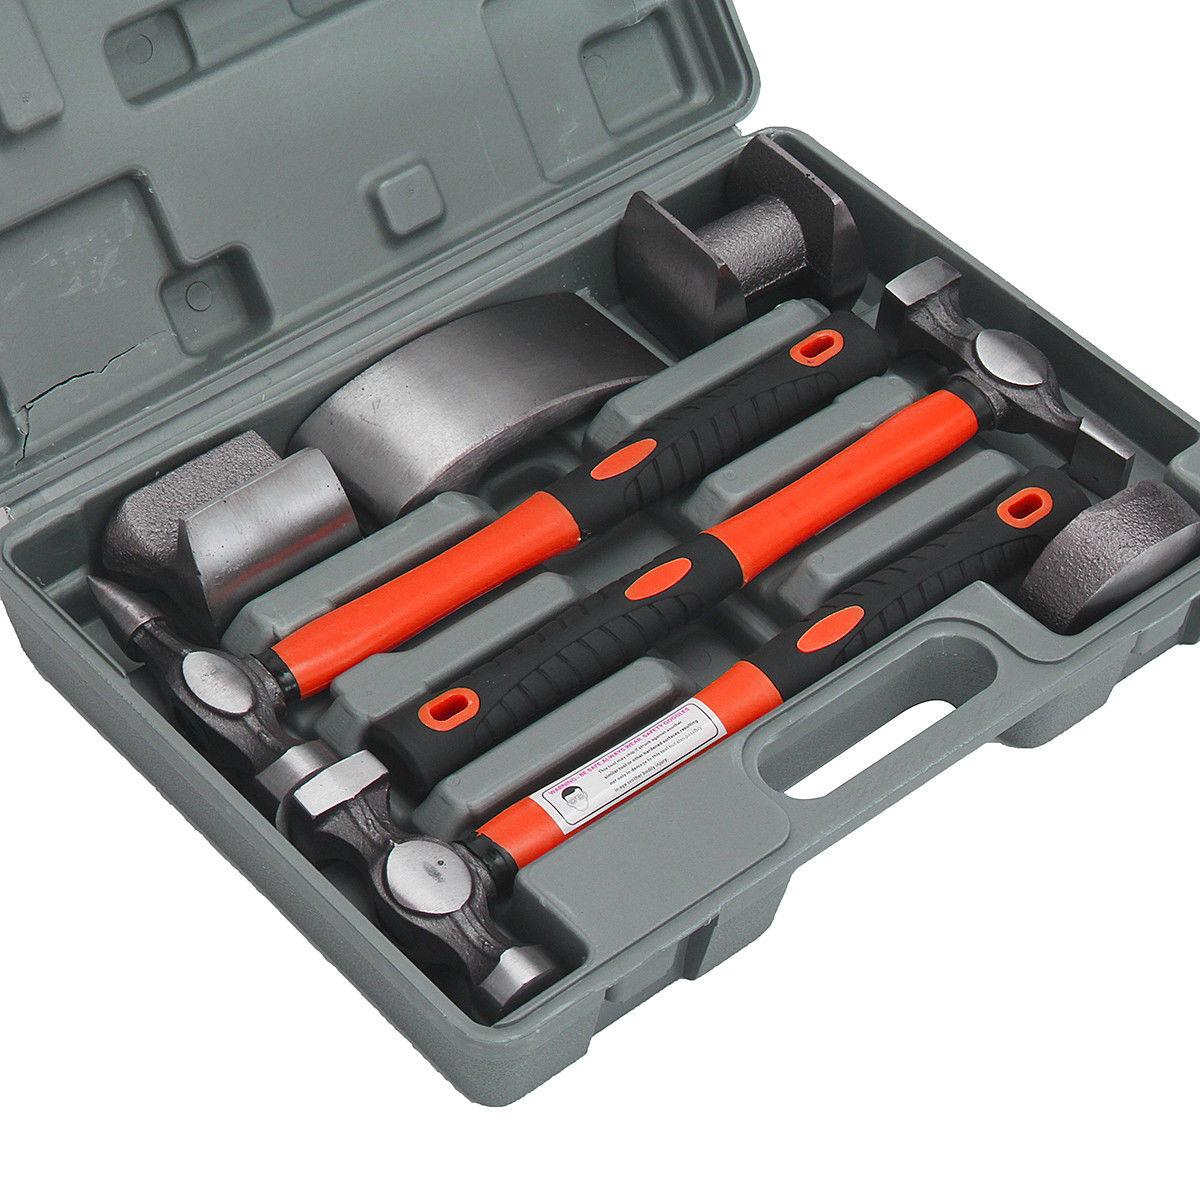 7Pcs Fiberglass Auto Body Repair Tools Fender Tool Kit Hammer Dolly Dent Bender